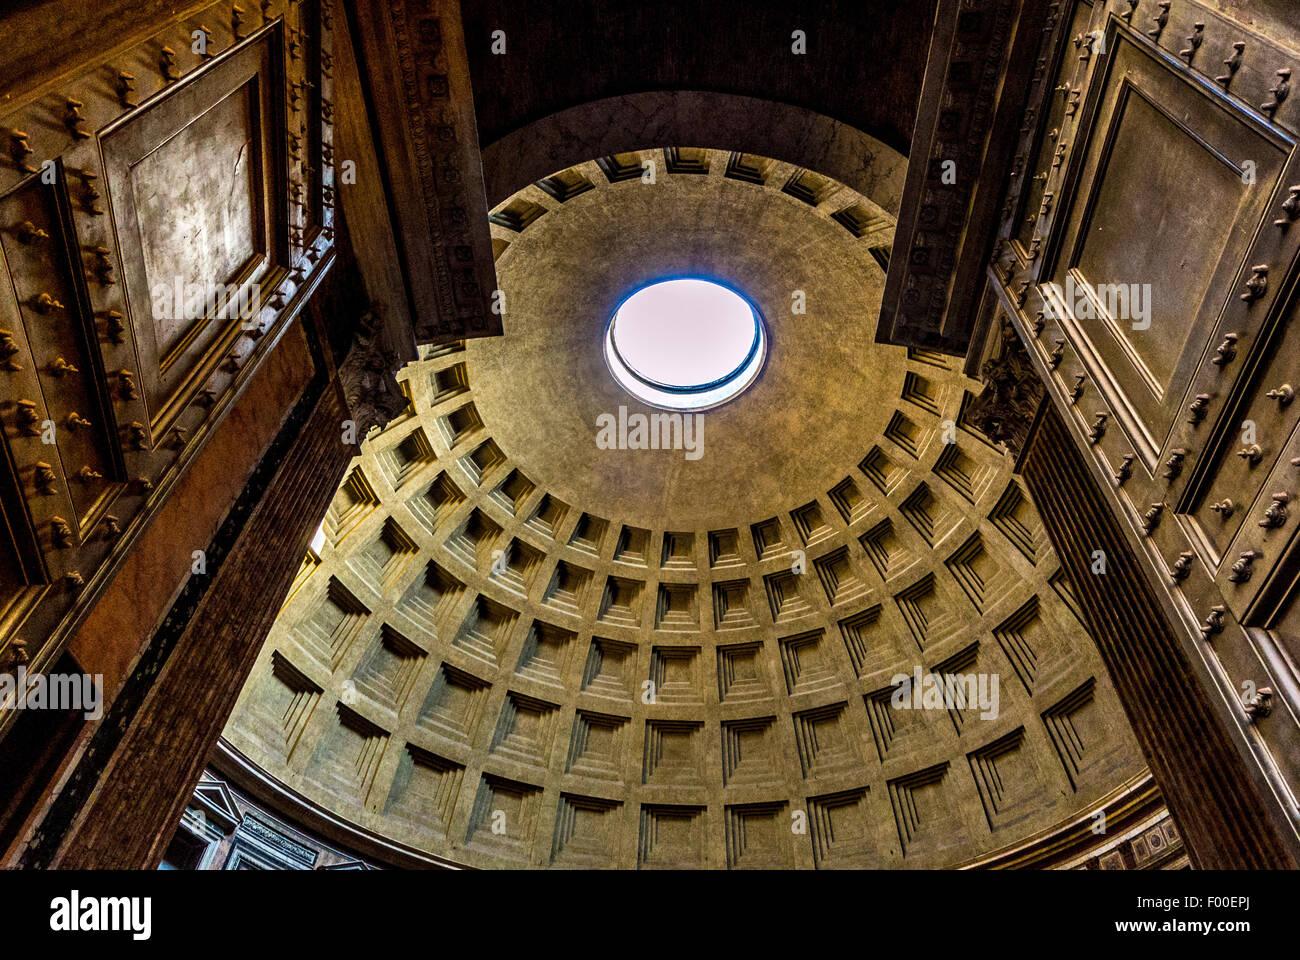 Ancient Roman Doors : Doors opening into oculus interior the pantheon ancient